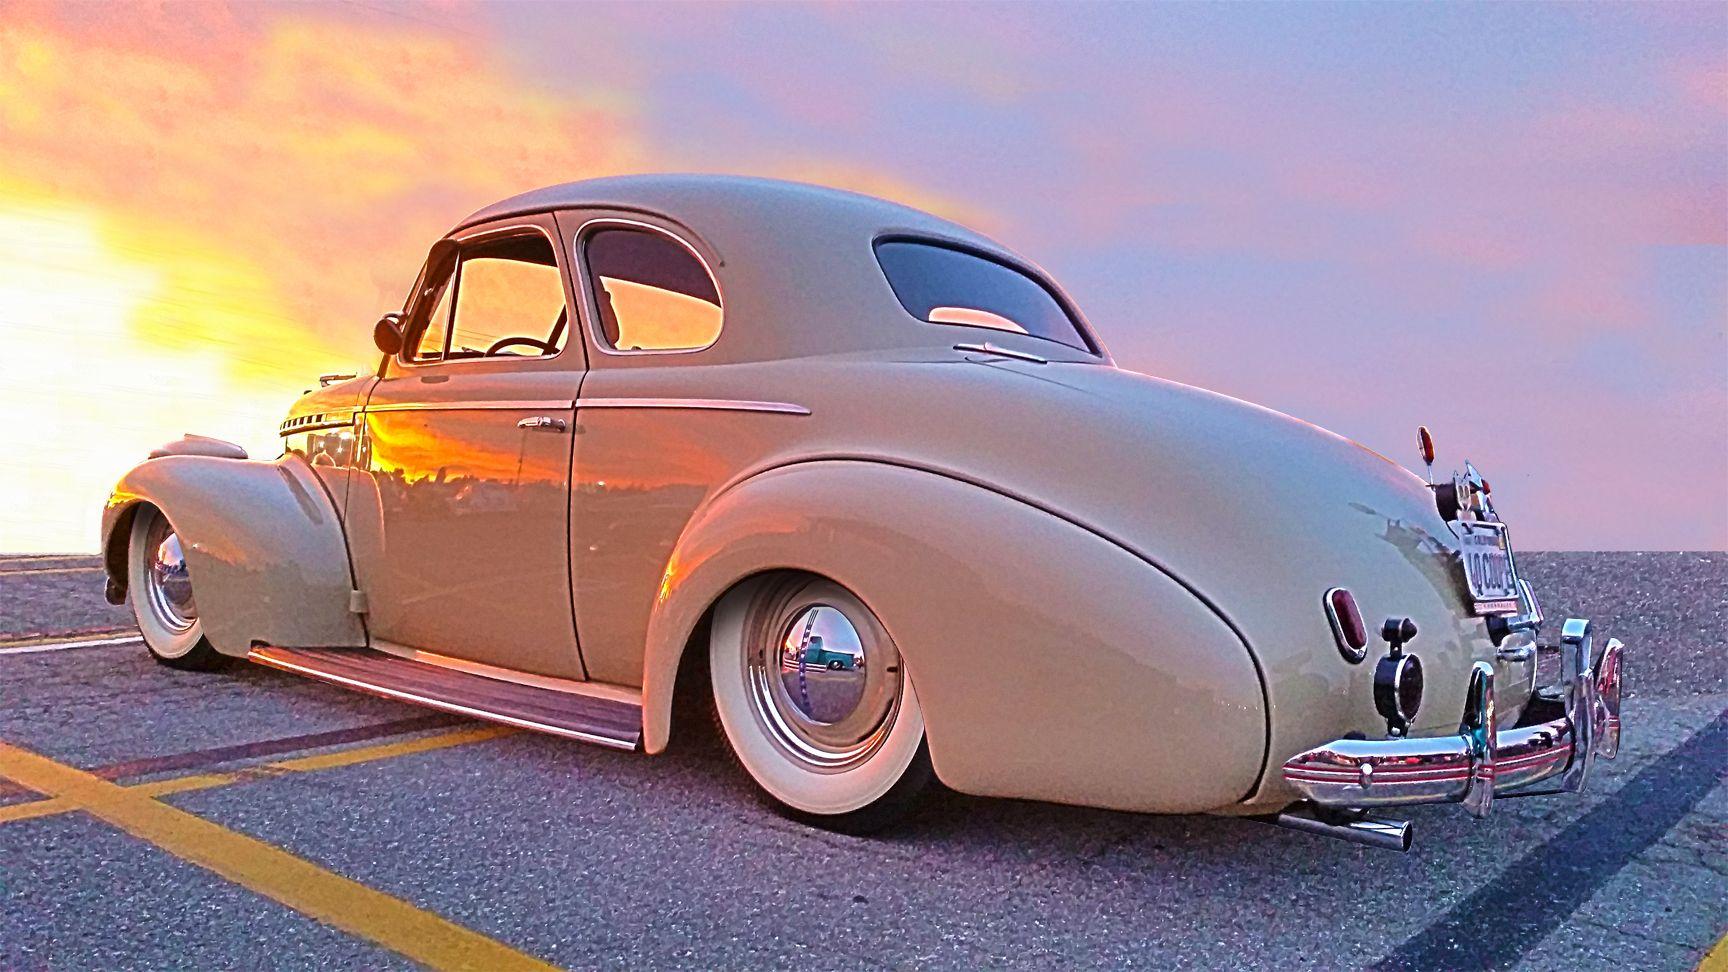 1940 Special Deluxe Chevrolet Coupe So Calif Chevrolet Custom Cars Veteran Car